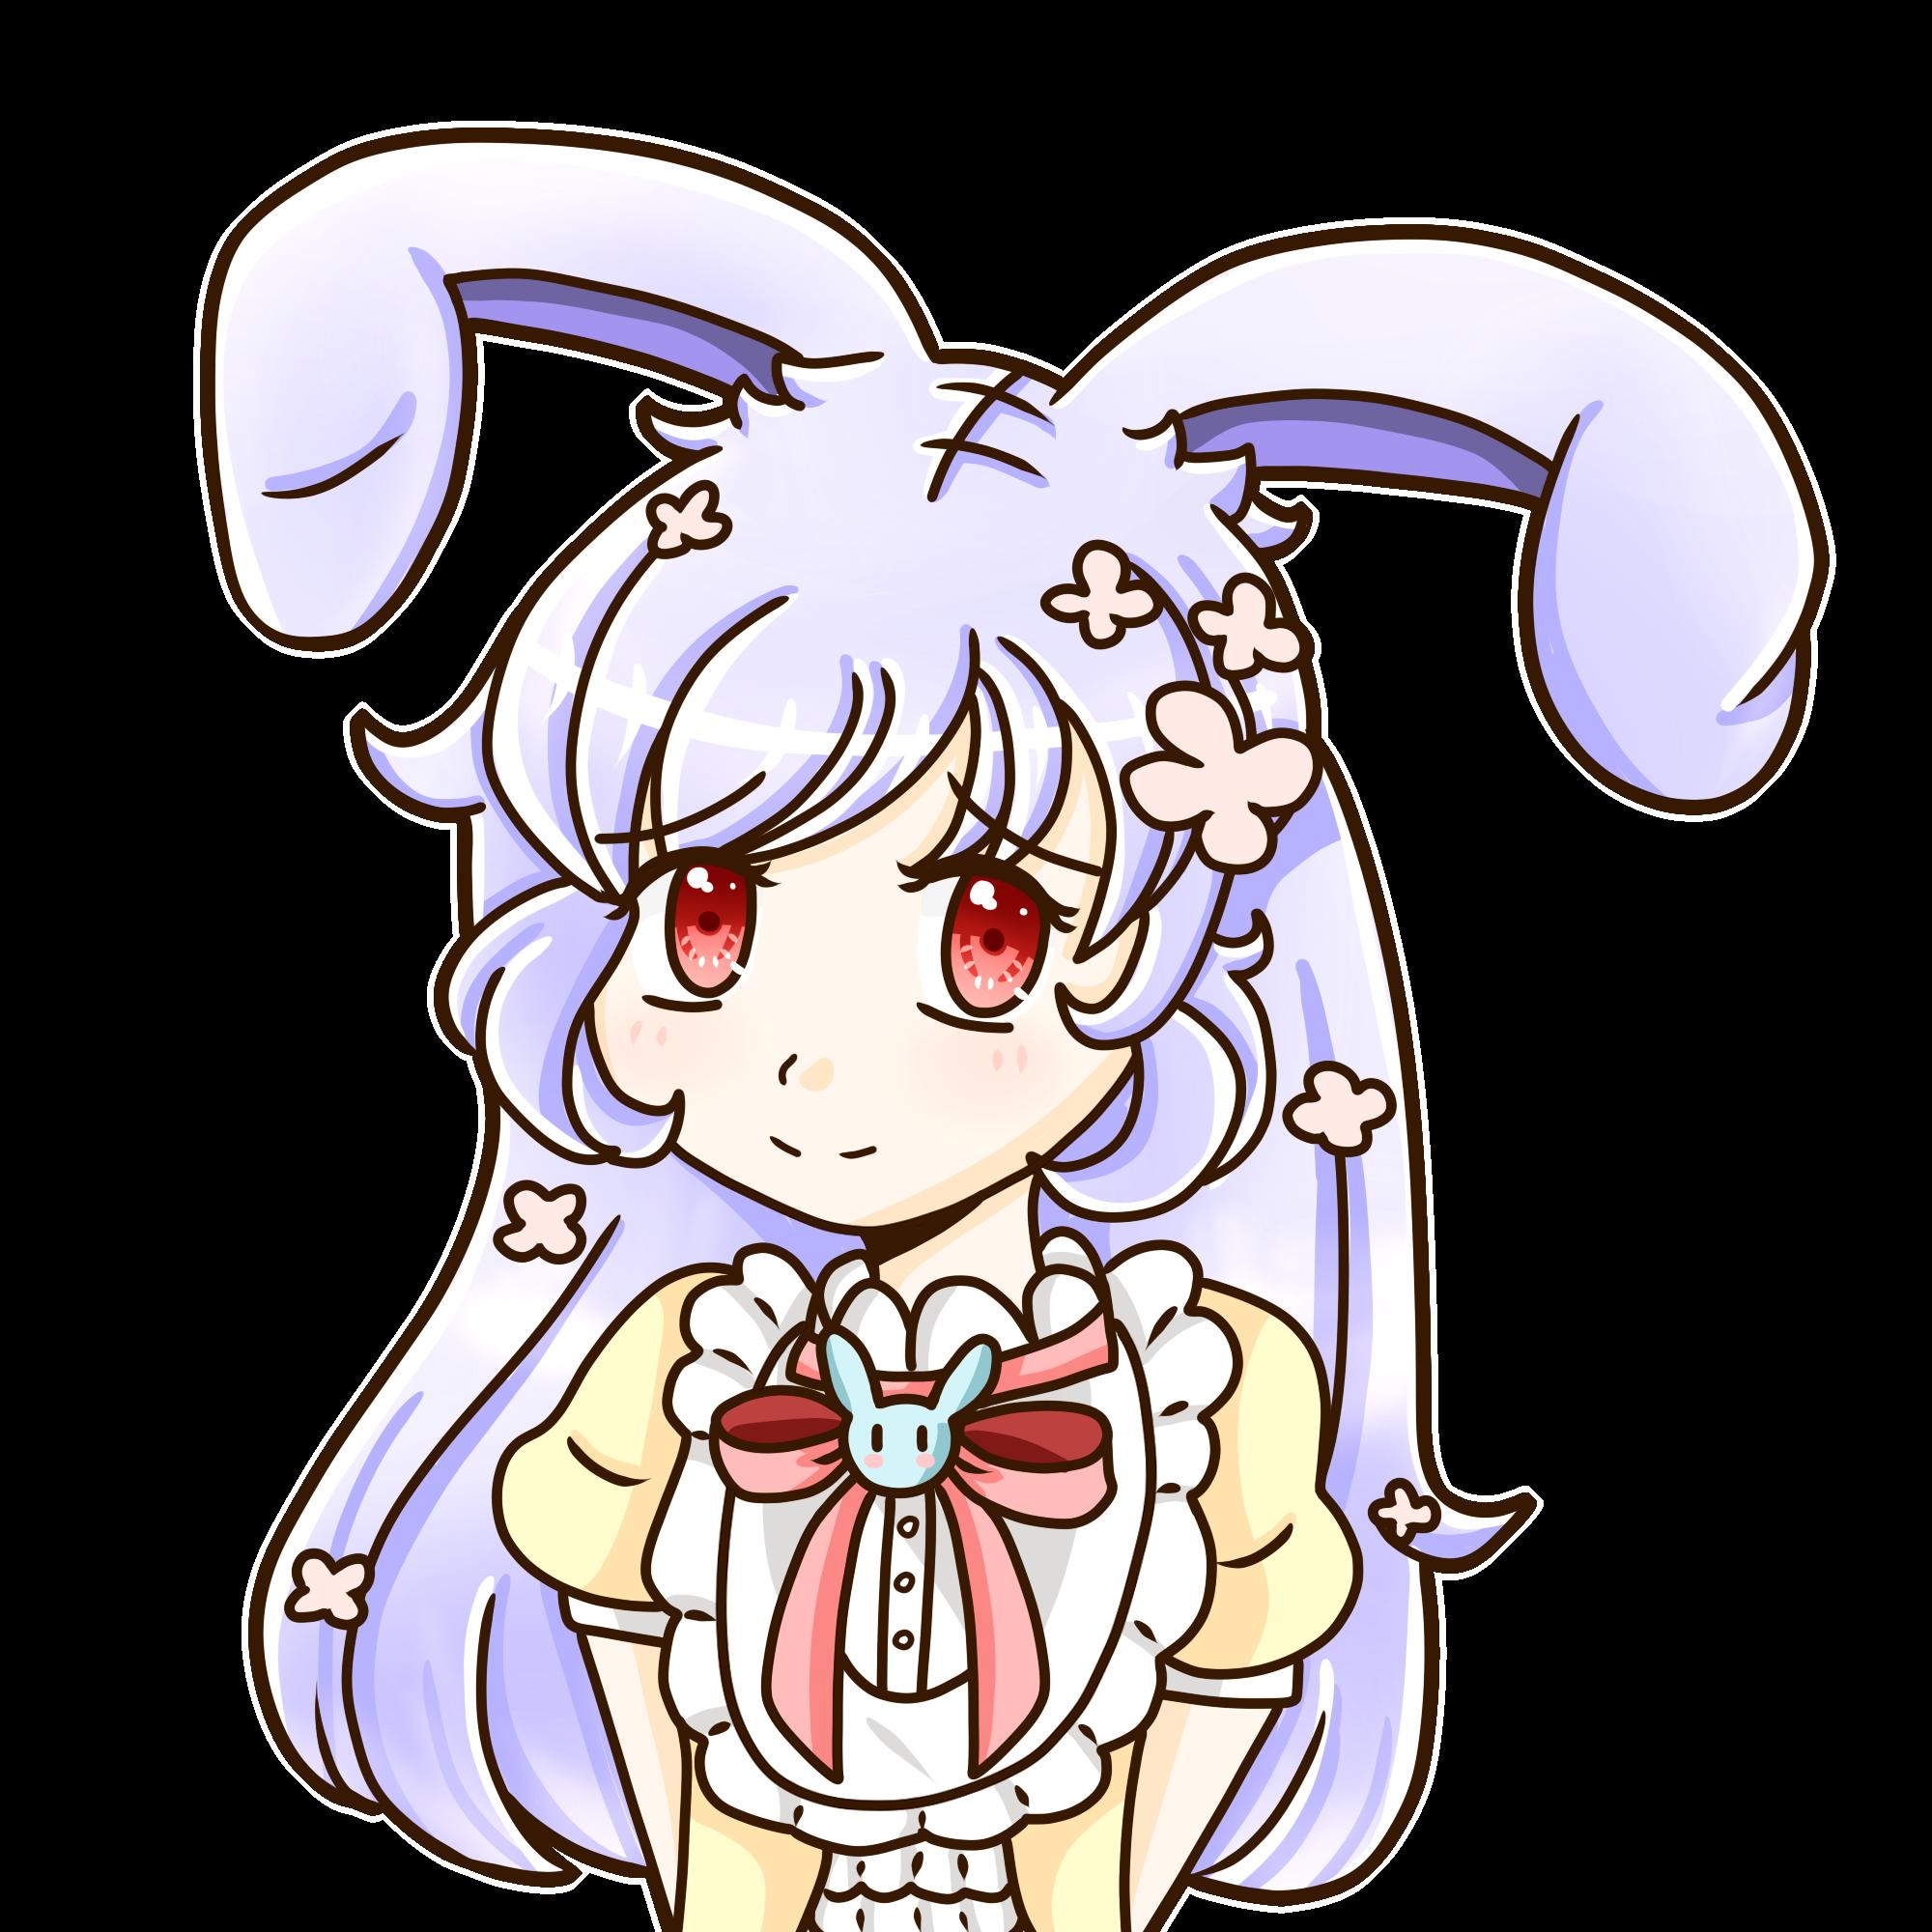 Girly clipart bunny. Girl by leafybearu on